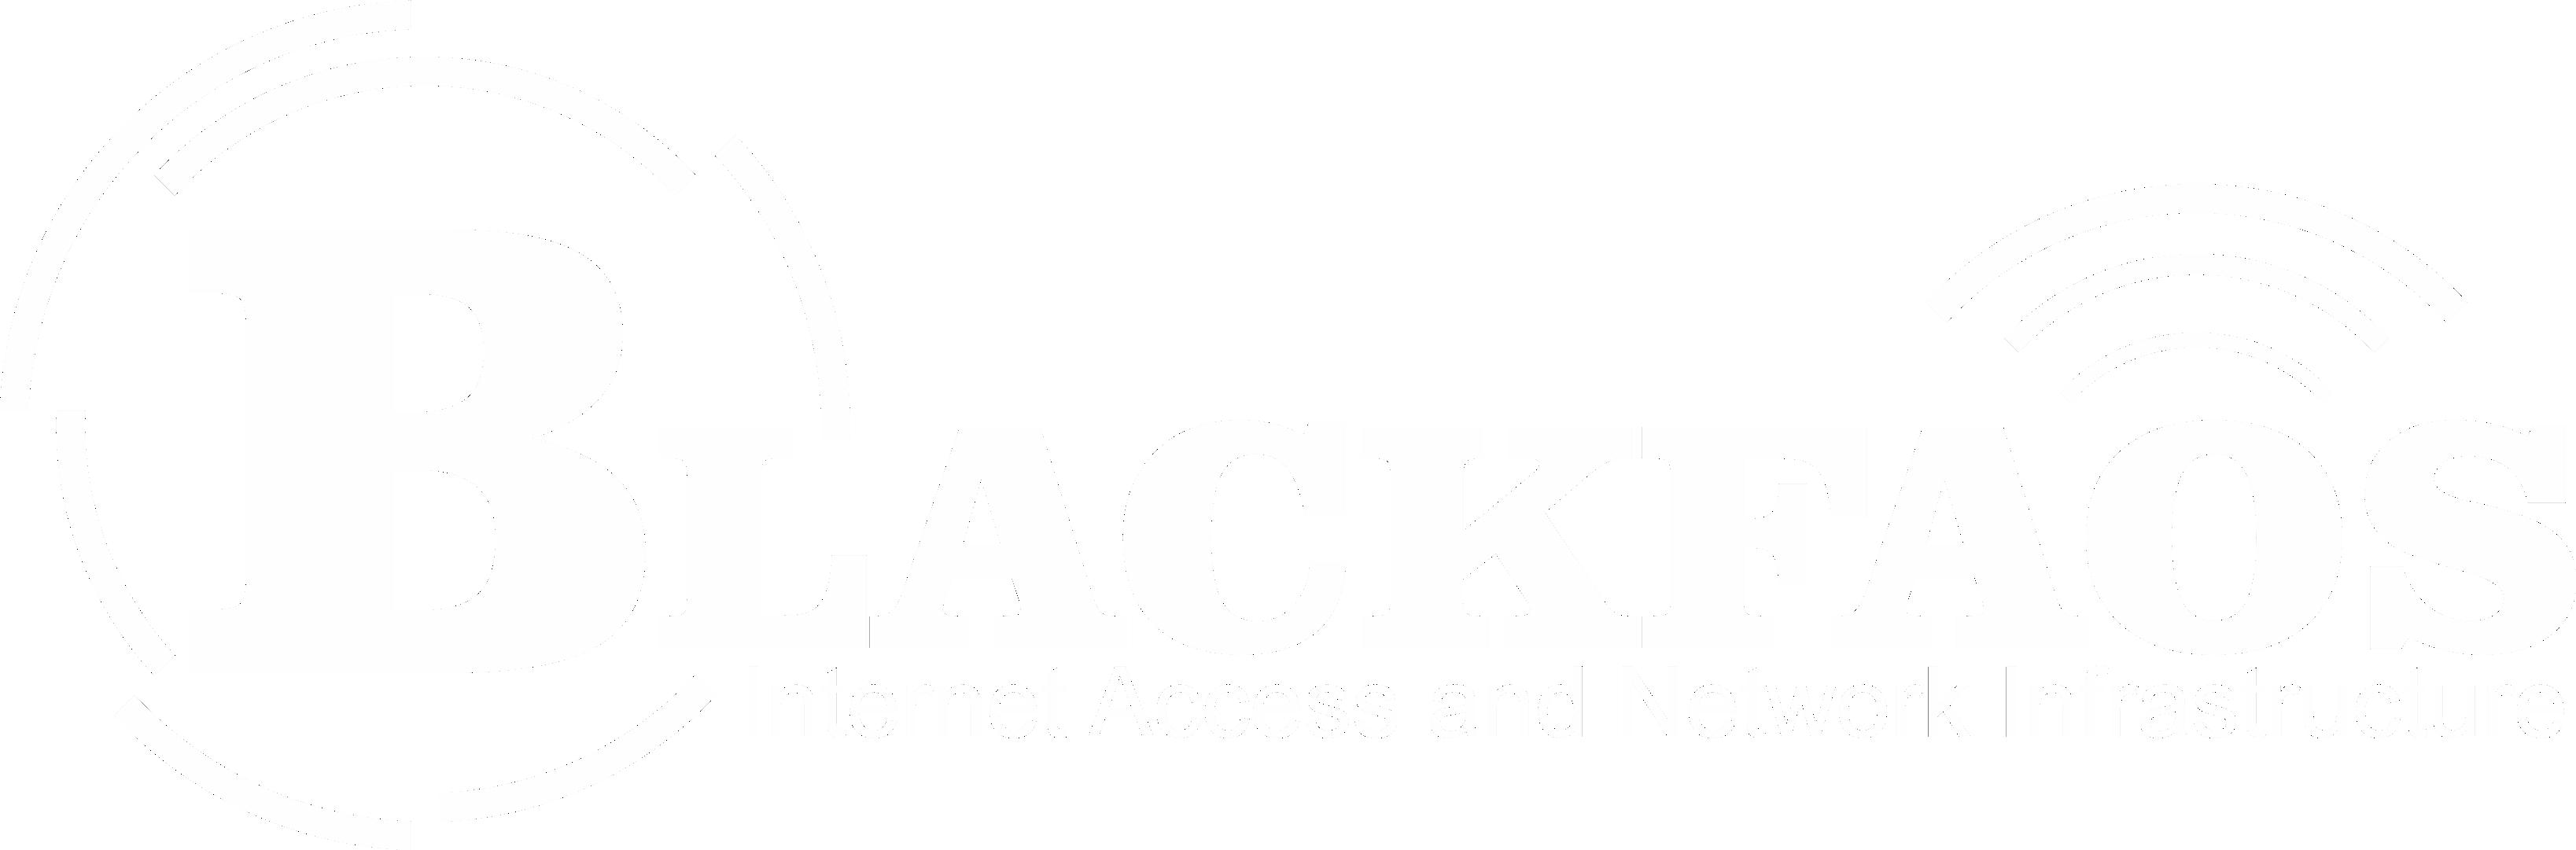 BLACKFAOS